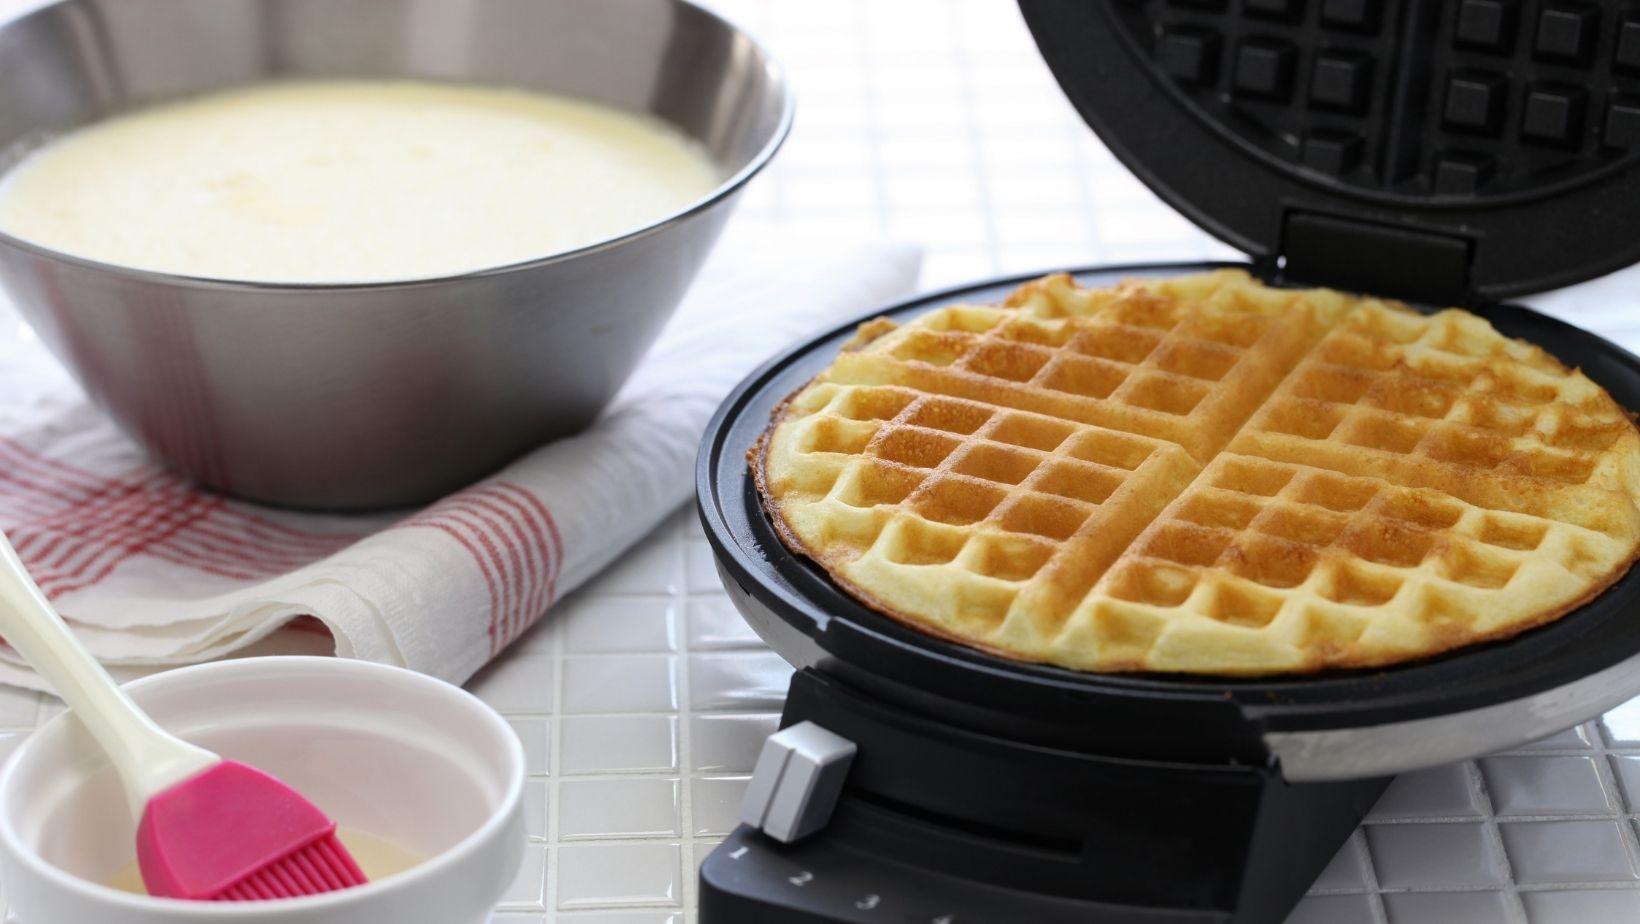 making homemade waffle on wafflemaker